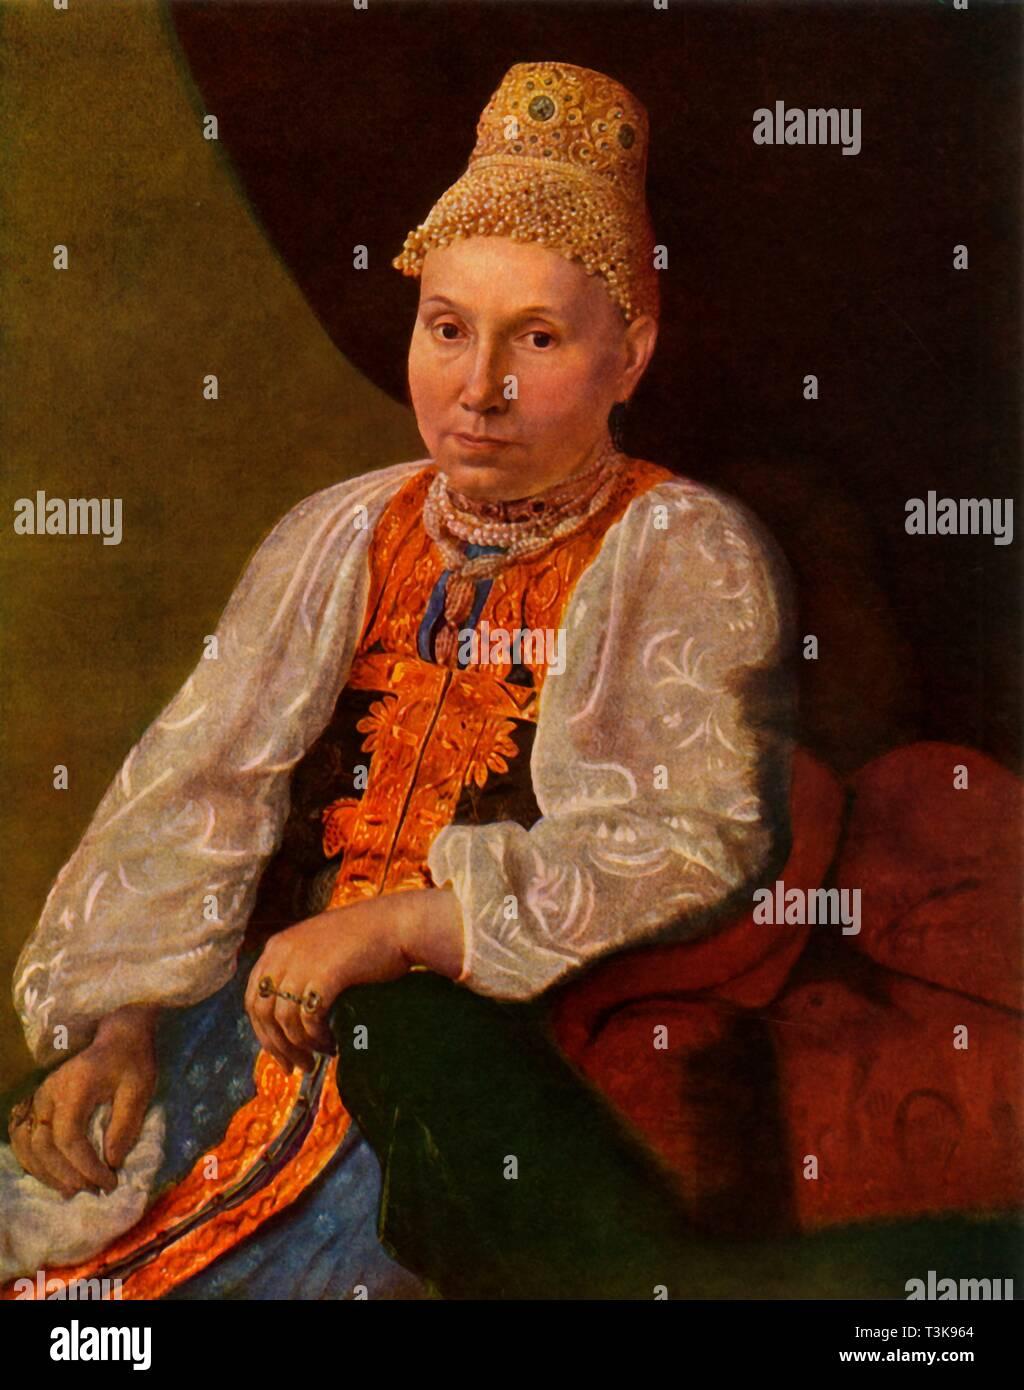 'Portrait of the Wife of Obraztsov, the Merchant from Rshev', 1830s?, (1965).  Creator: Aleksey Venetsianov. - Stock Image